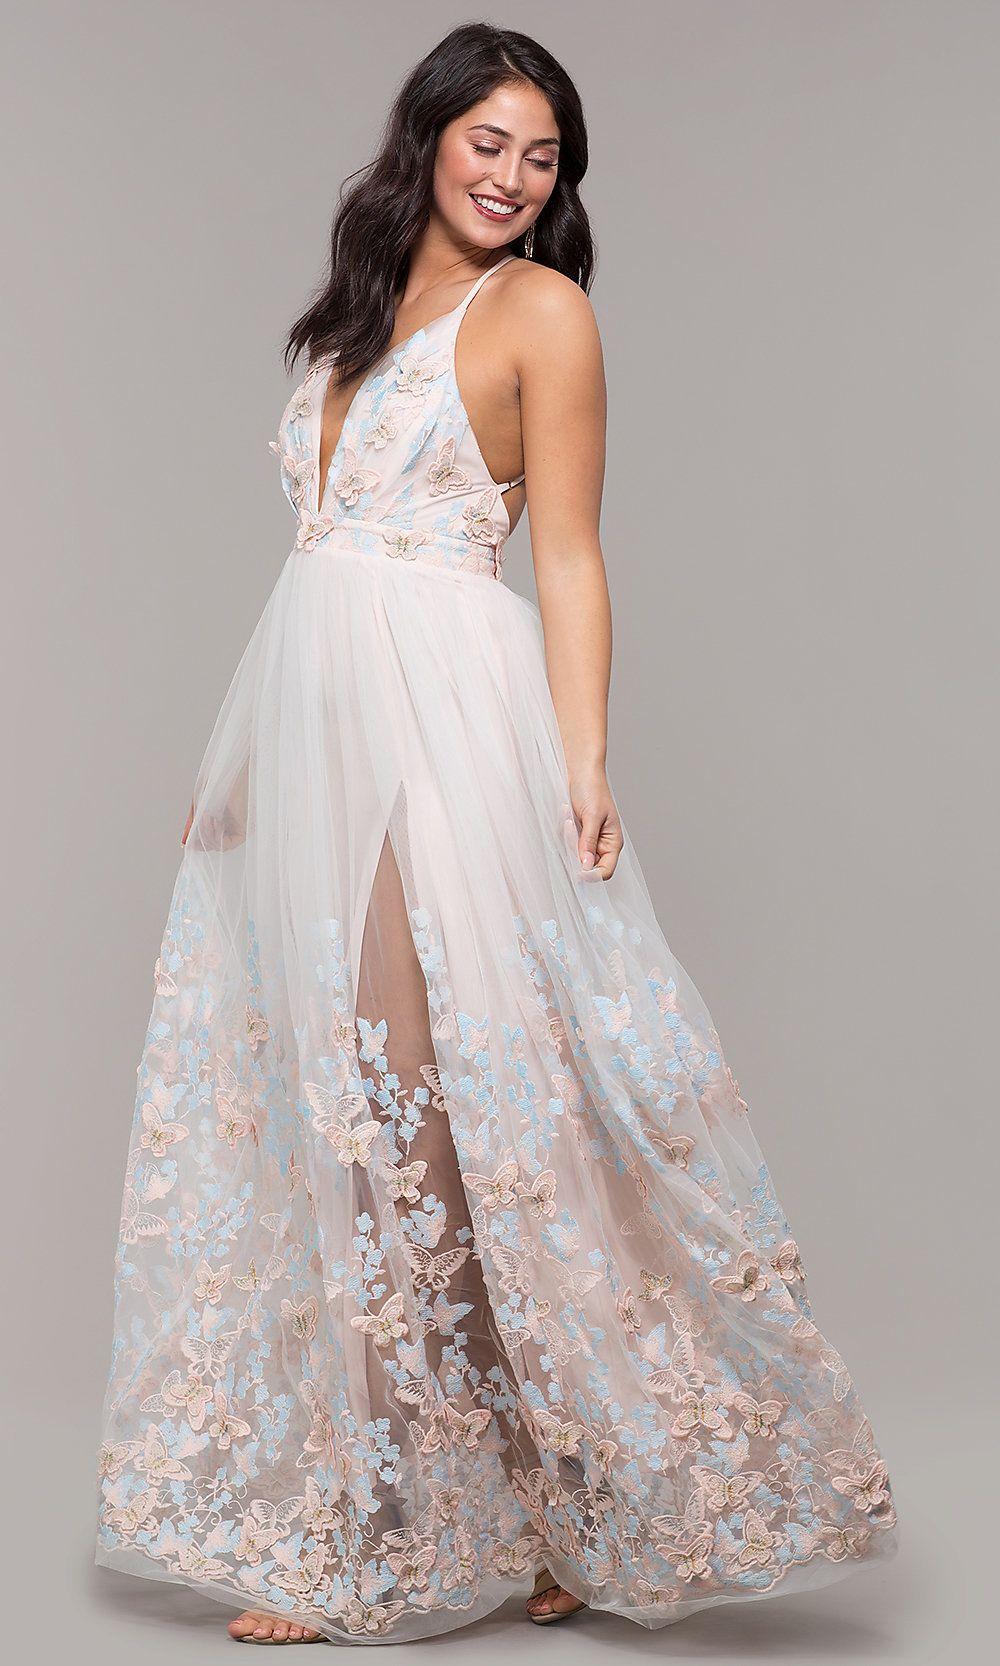 fa0869dc383 Long V-Neck 3-D-Appliqued Prom Dress by Kalani Hilliker in 2019 ...